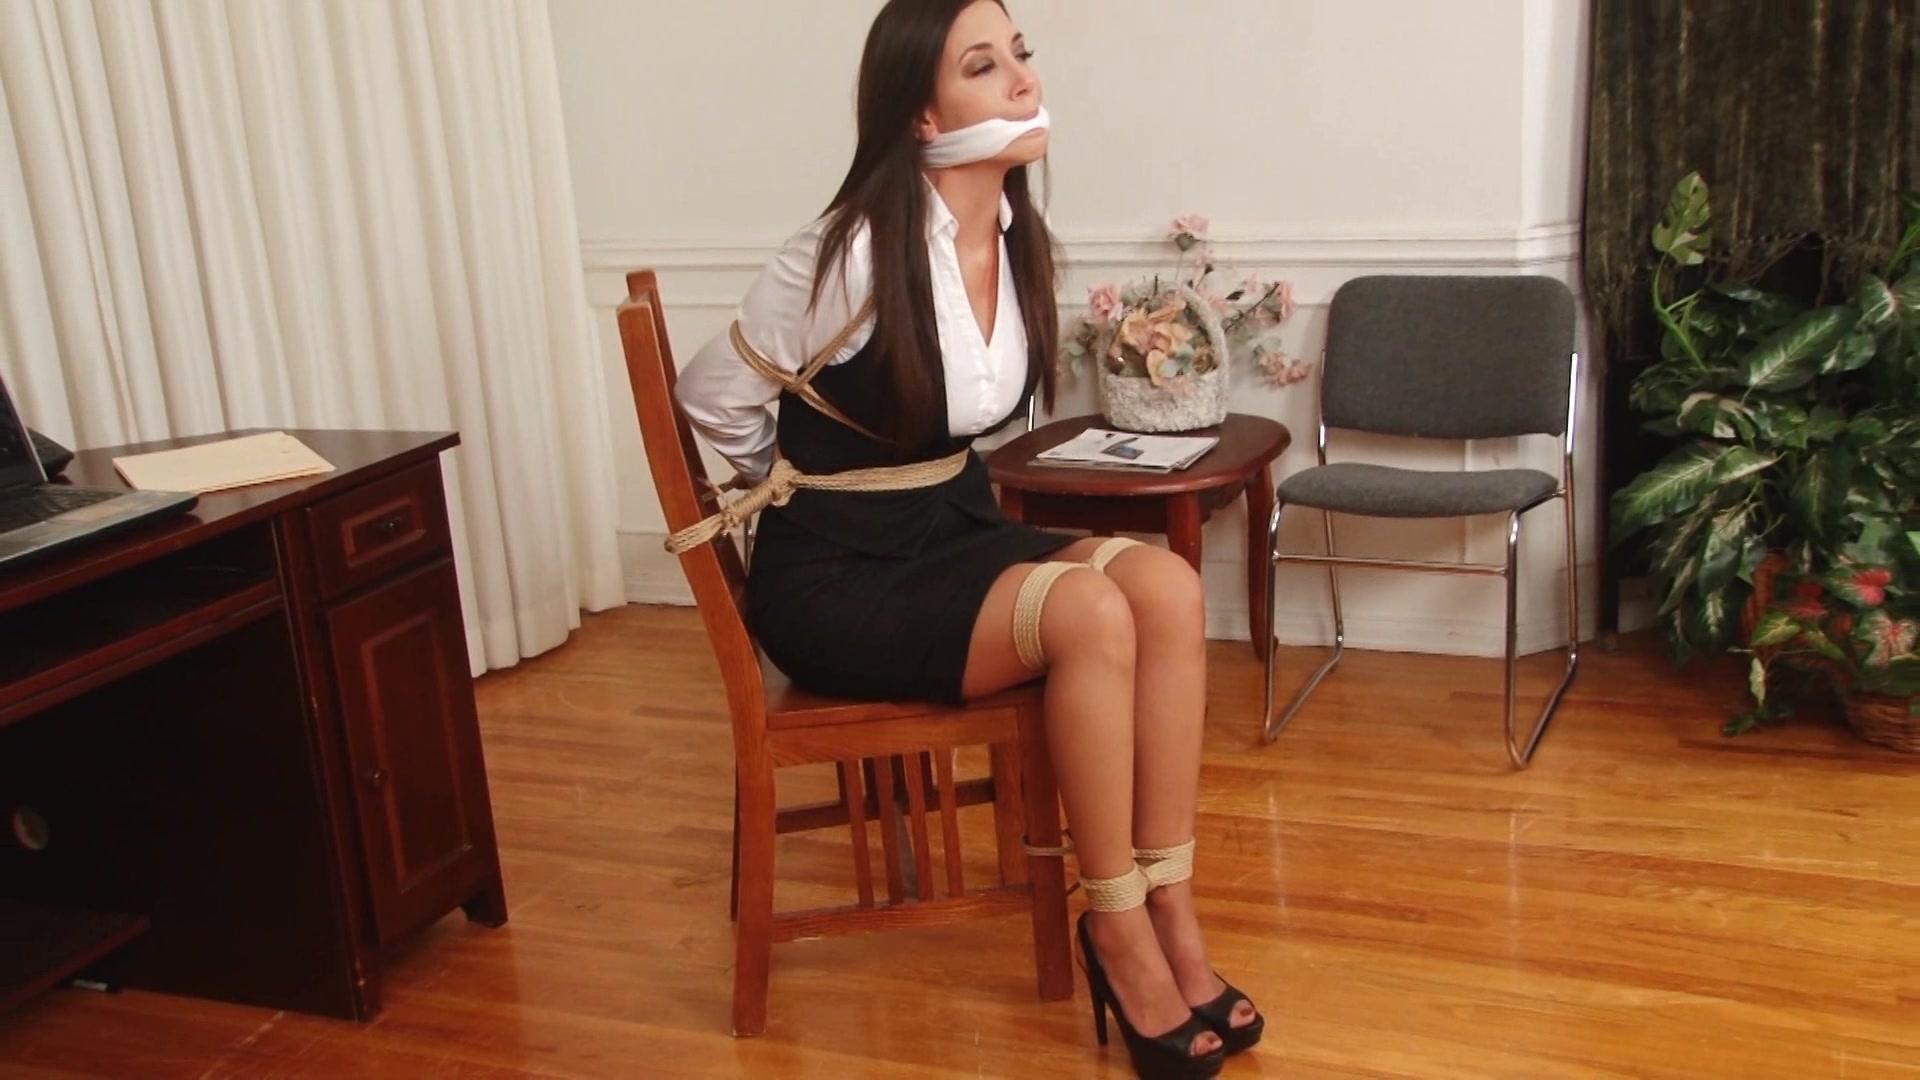 Секретарша сосет босу, Секретарша сосет хуй - бесплатная порнушка 8 фотография